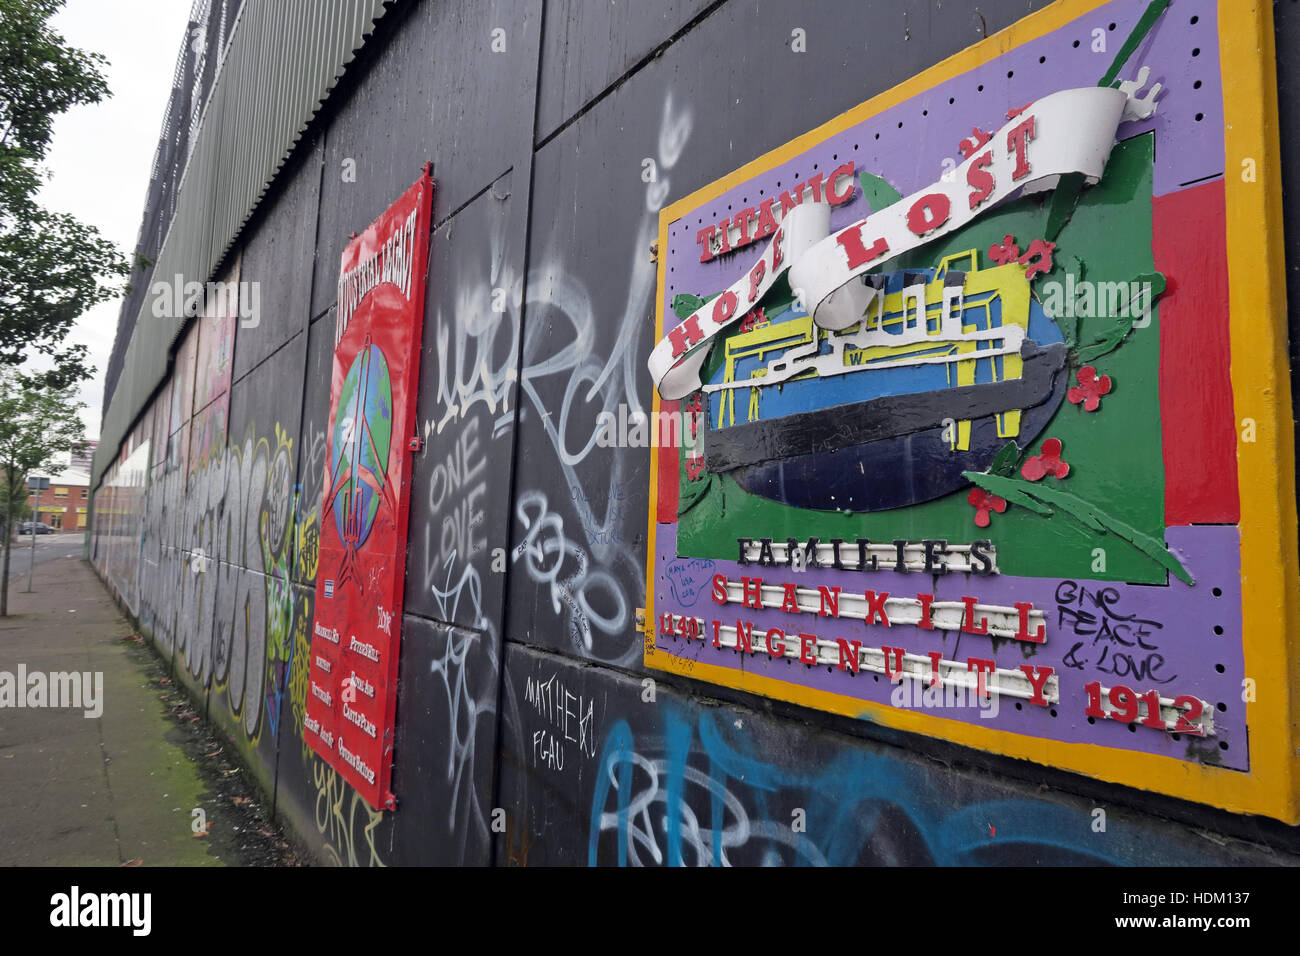 Laden Sie dieses Alamy Stockfoto Titanic Hope Lost - Belfast International Peace Wand Cupar Weg, West Belfast, NI, UK - HDM137